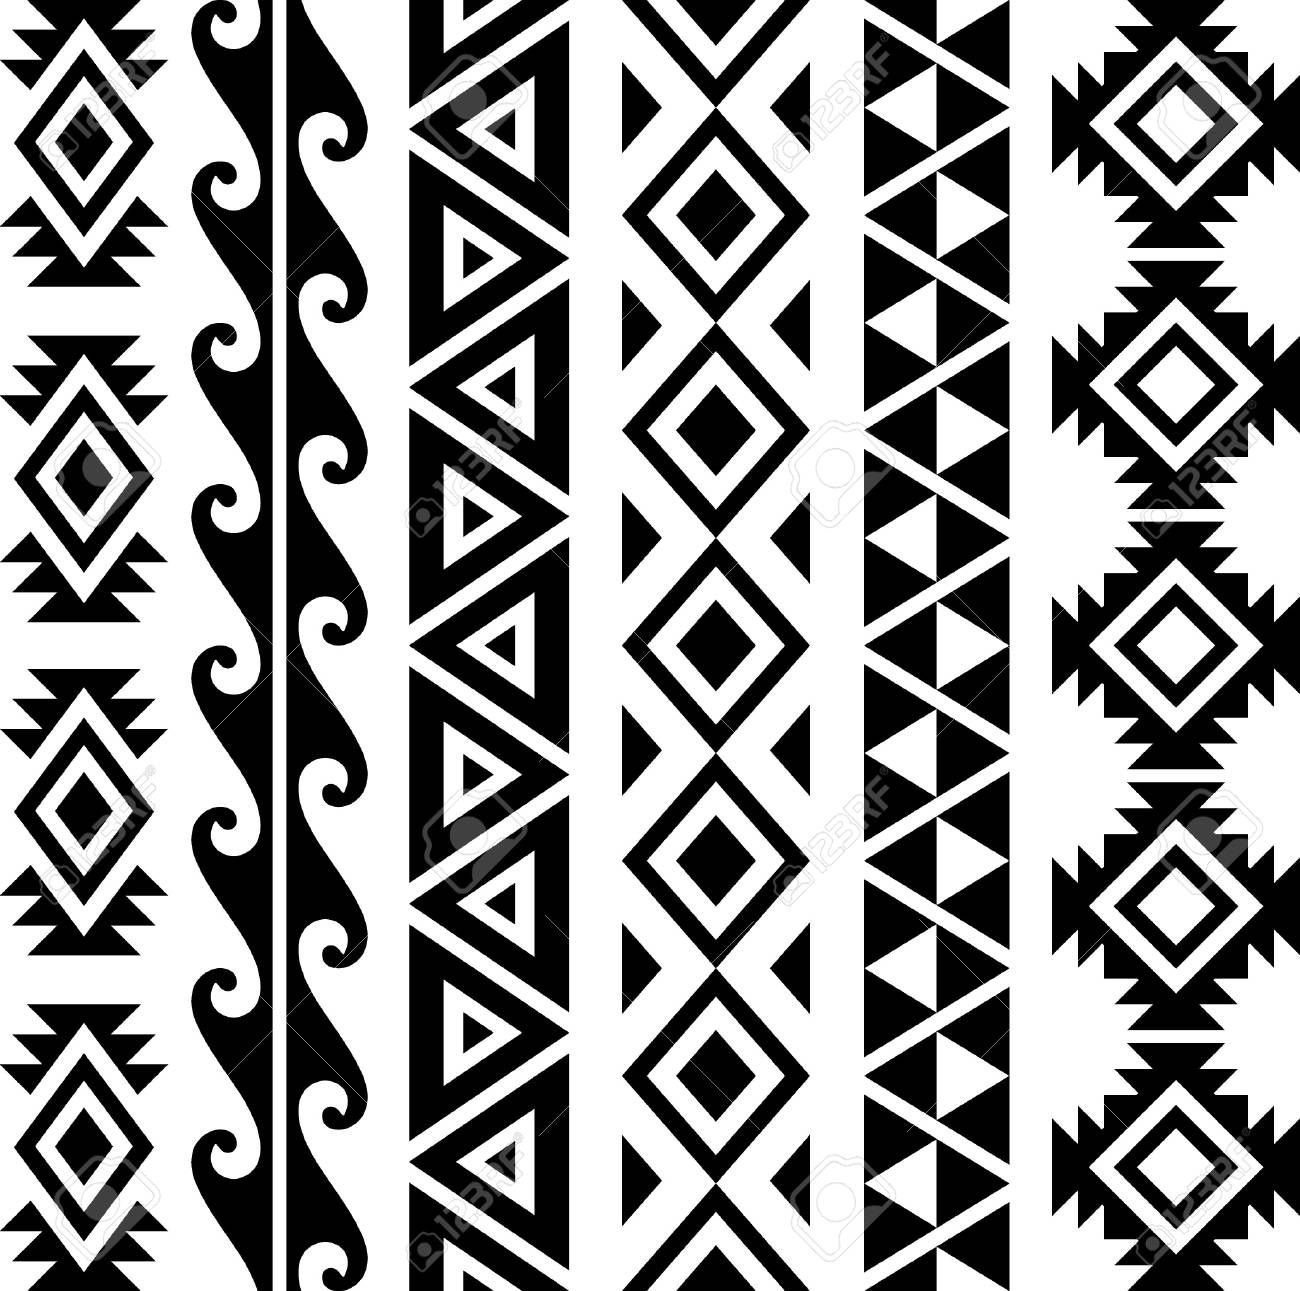 Hawaiian Seamless Patterns Collection Aff Seamless